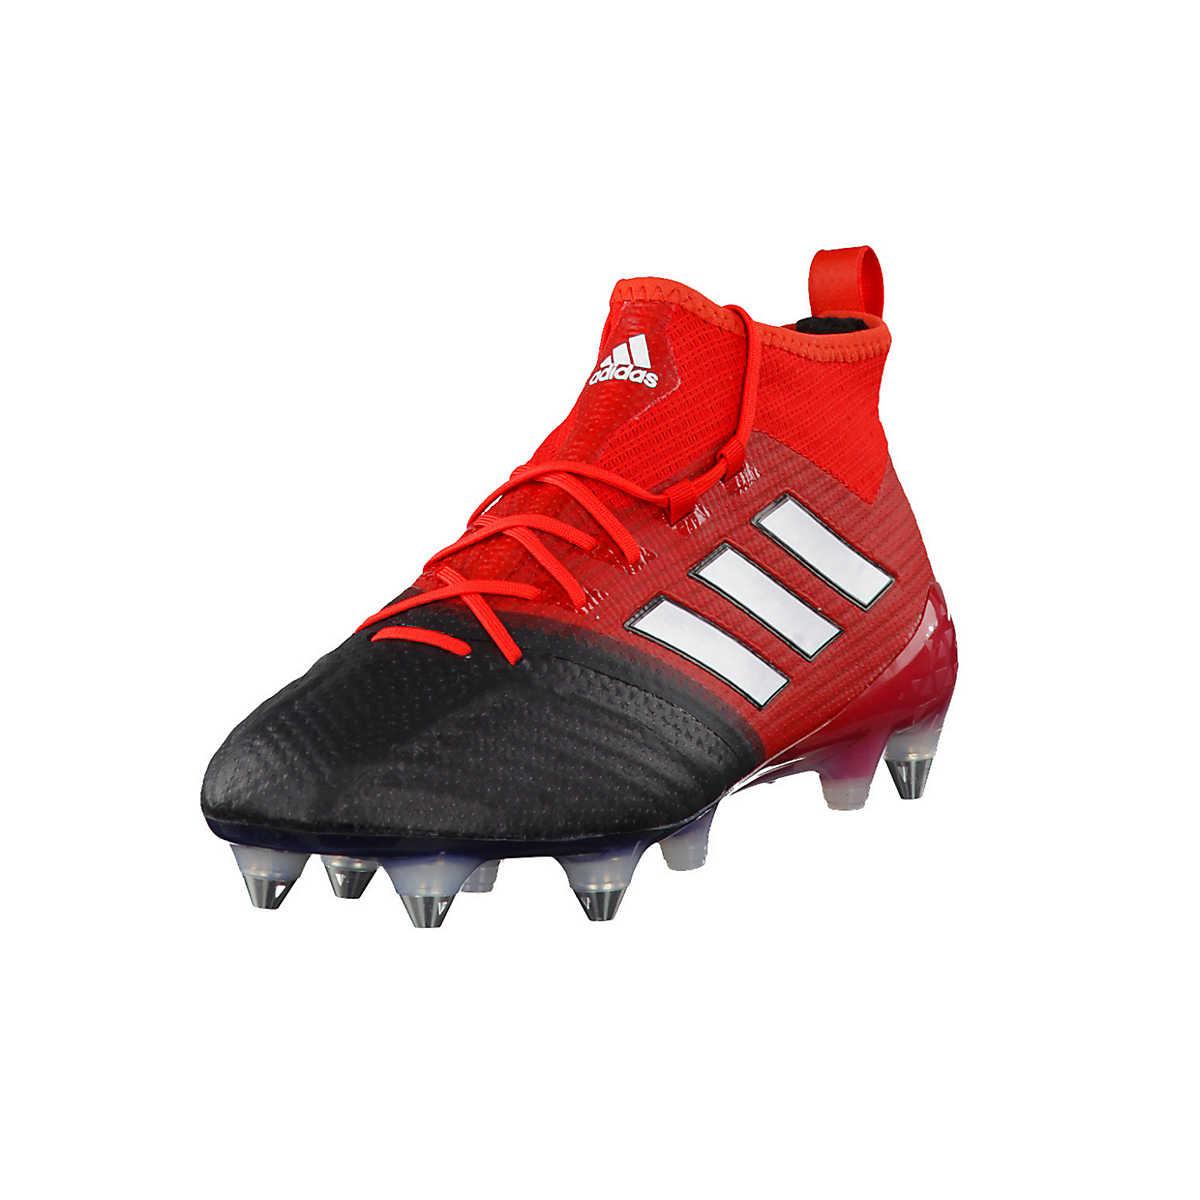 adidas Performance Sportschuhe rot-kombi - adidas Performance - Sportschuhe - Schuhe - mirapodo.de